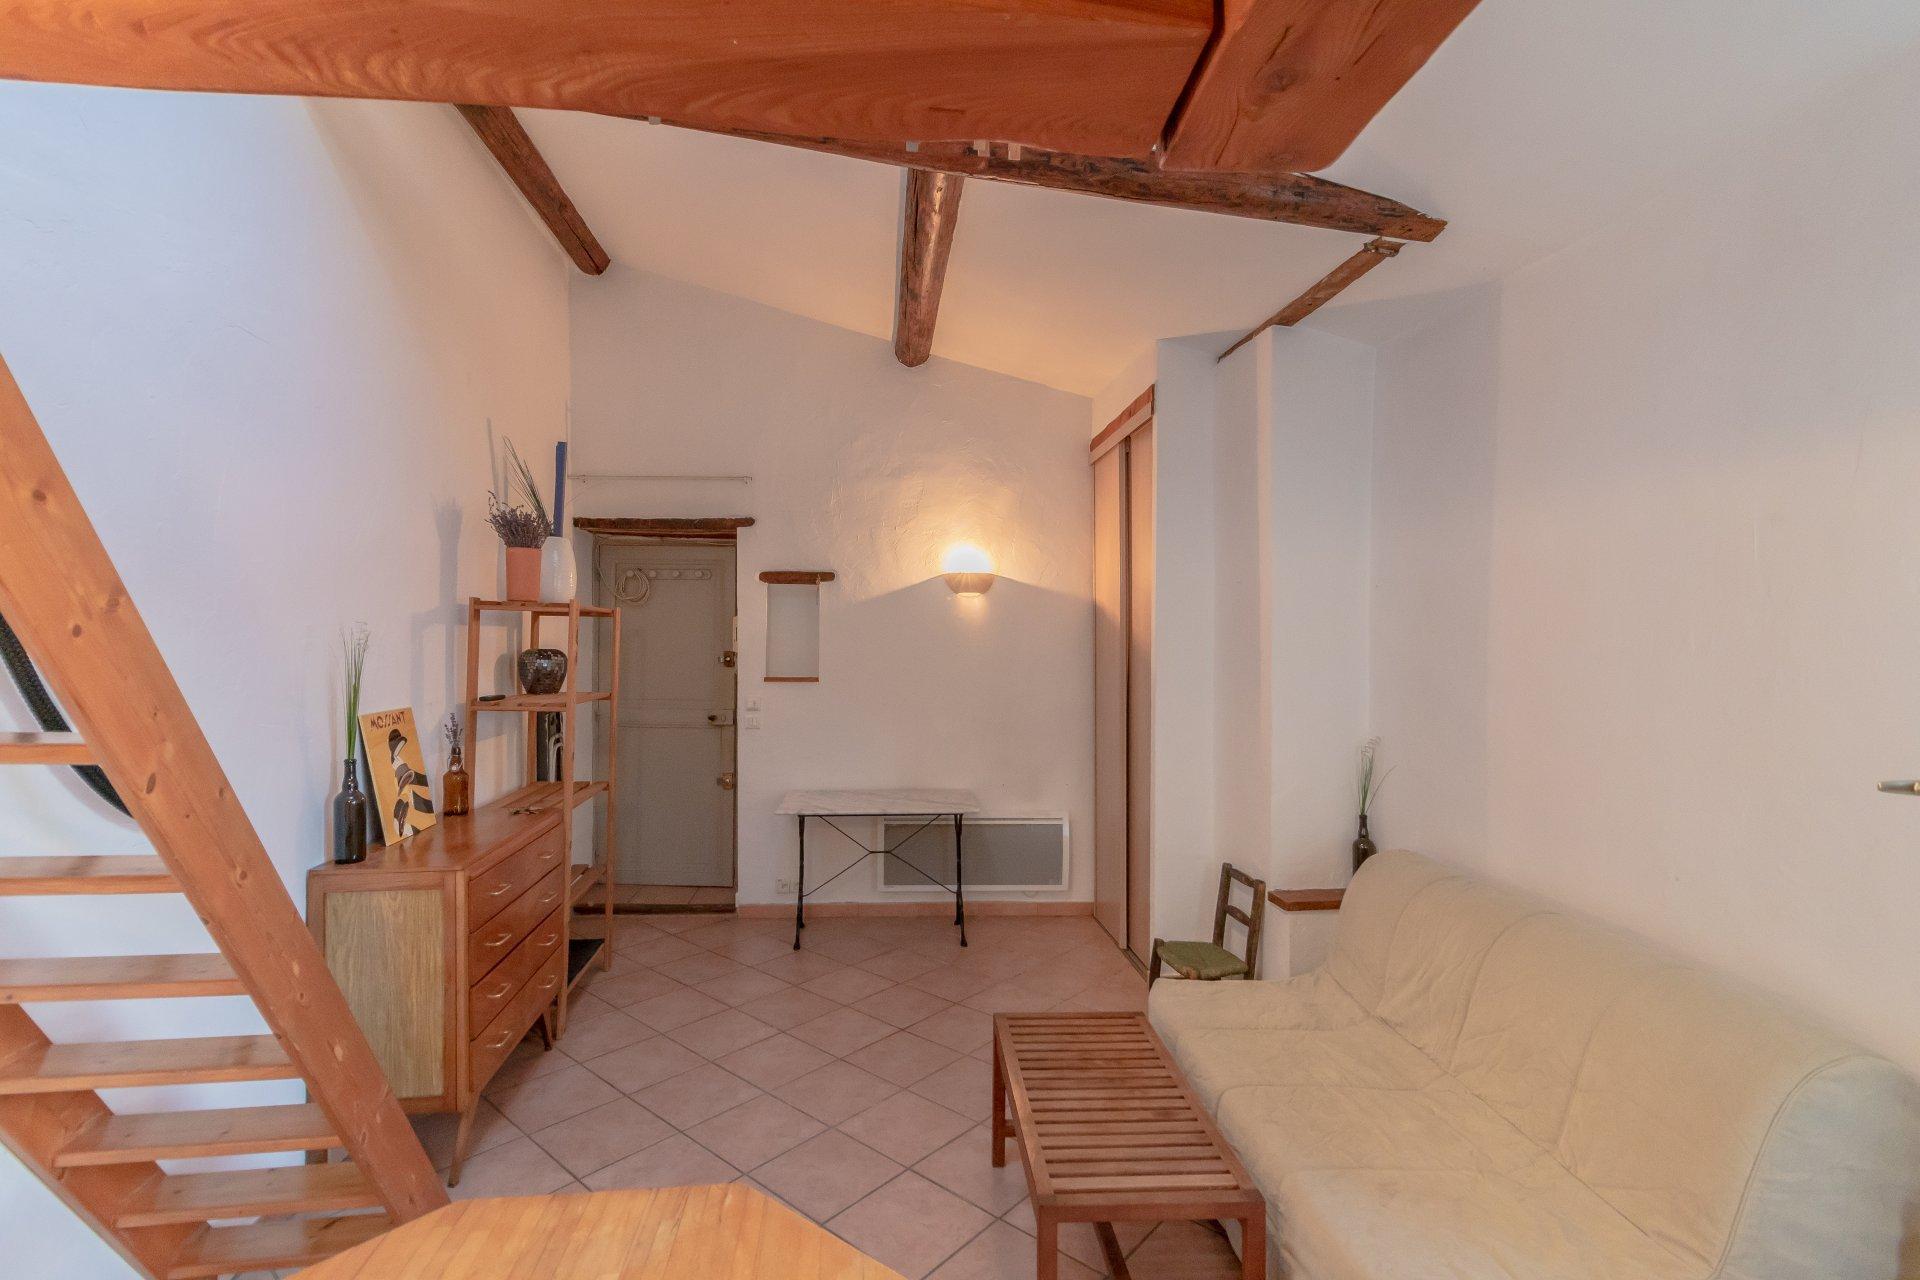 antibes vieille ville studio meublé avec mezannine